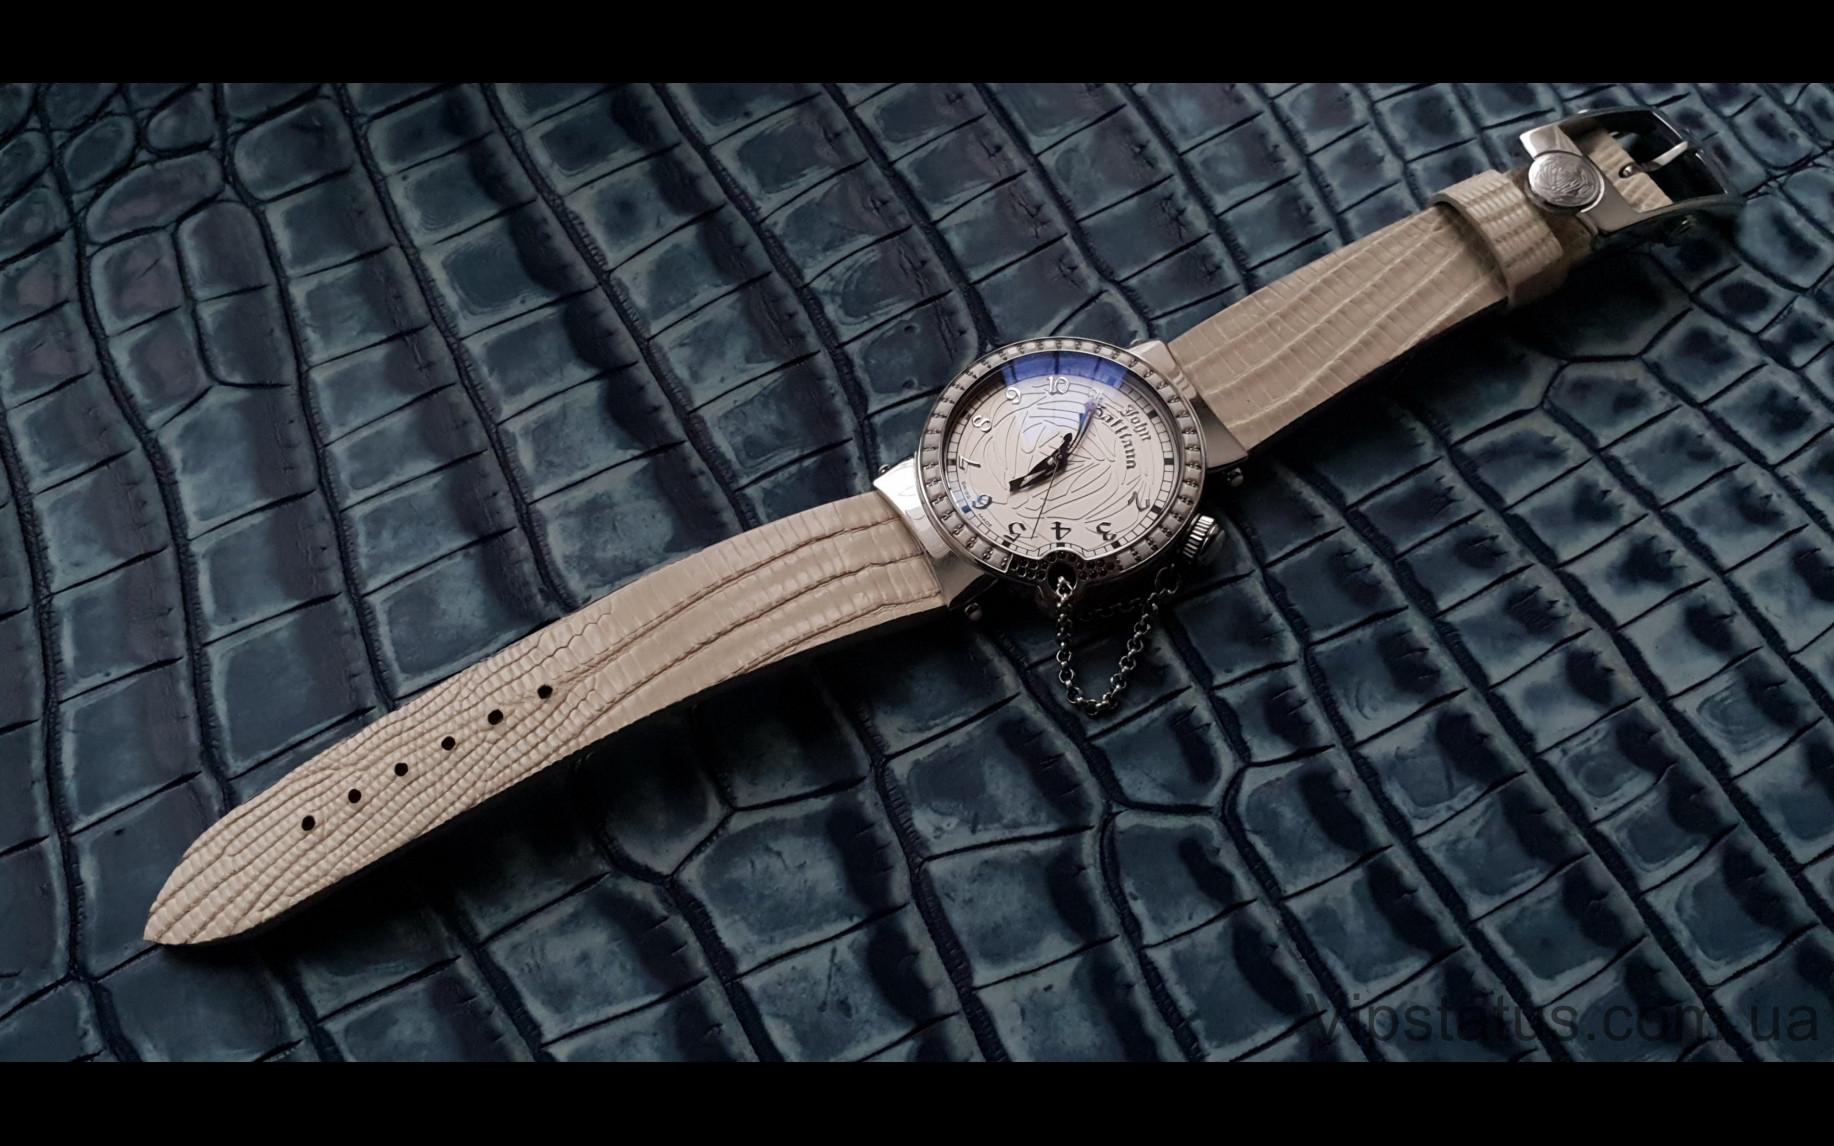 Elite Экзотический ремешок для часов John Galliano кожа крокодила Exotic Crocodile Strap for John Galliano watches image 4